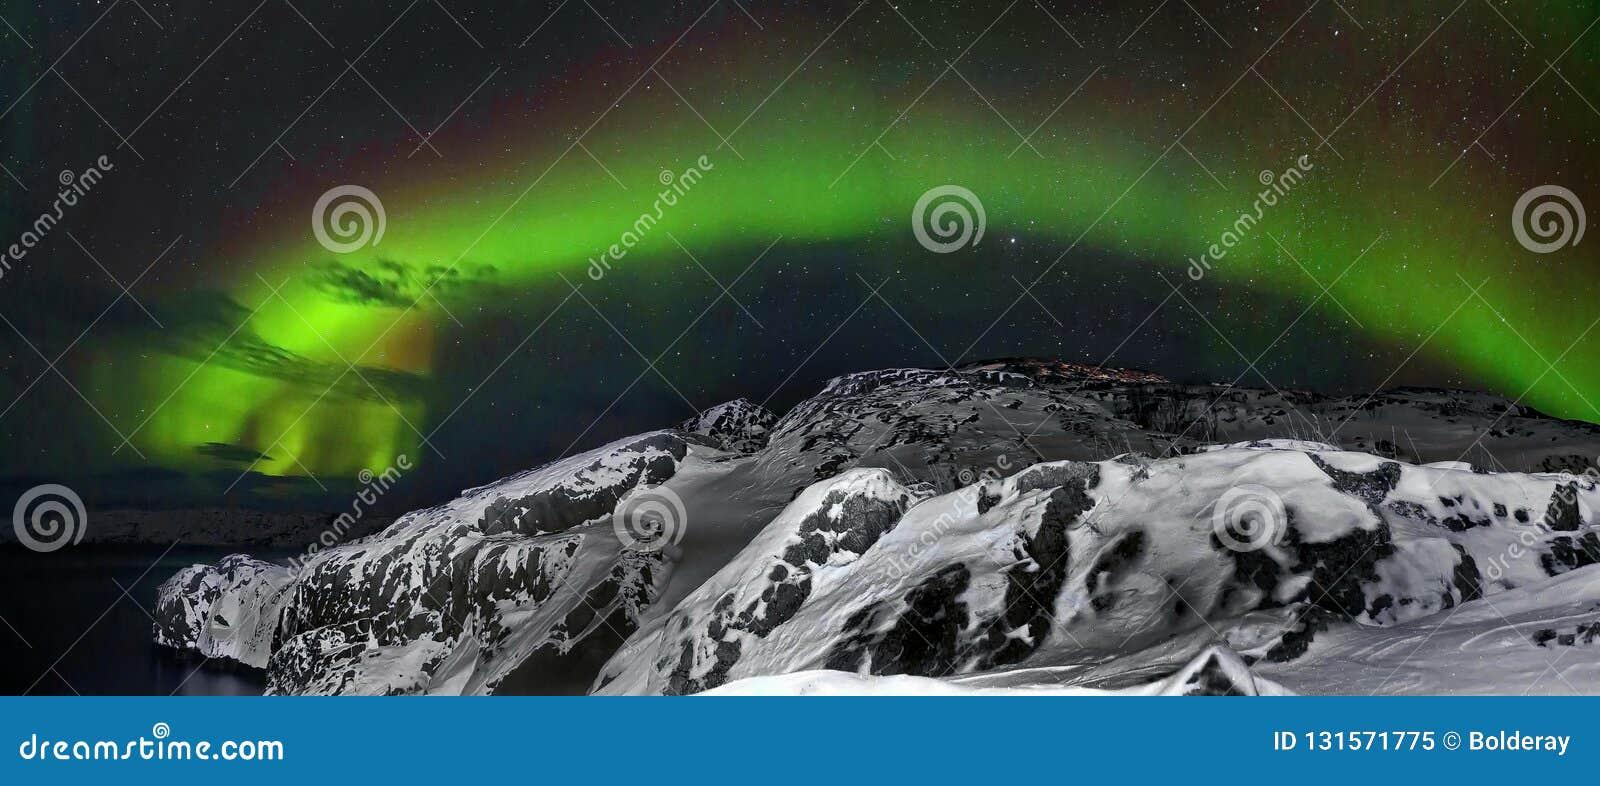 Mooi polair lichtenaurora borealis, dageraad over heuvels en toendra in de winter